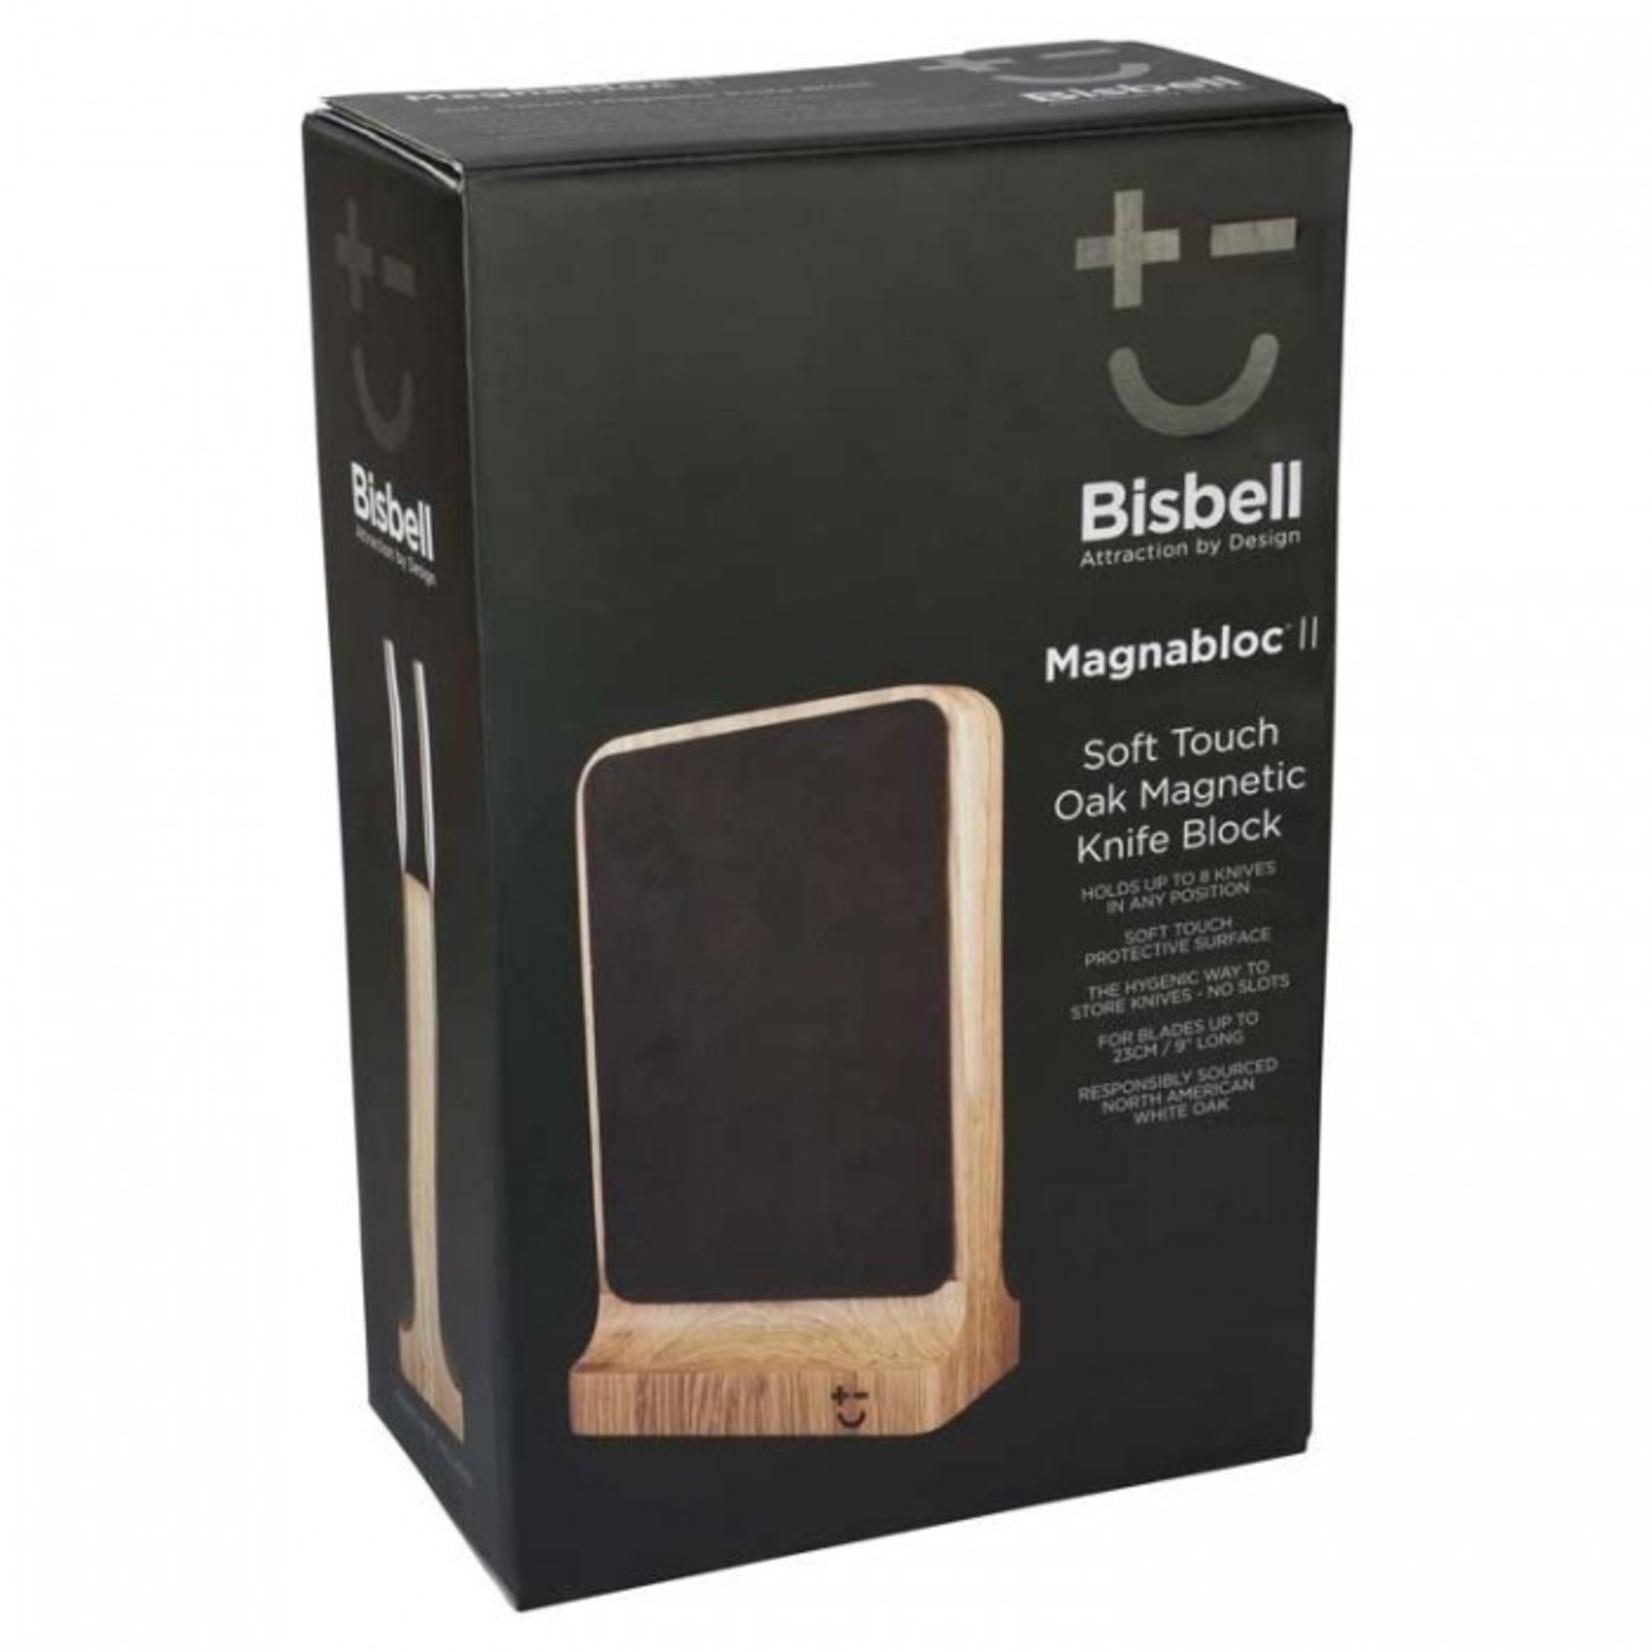 Bisbell Bisbell Magnabloc II Magneetblok